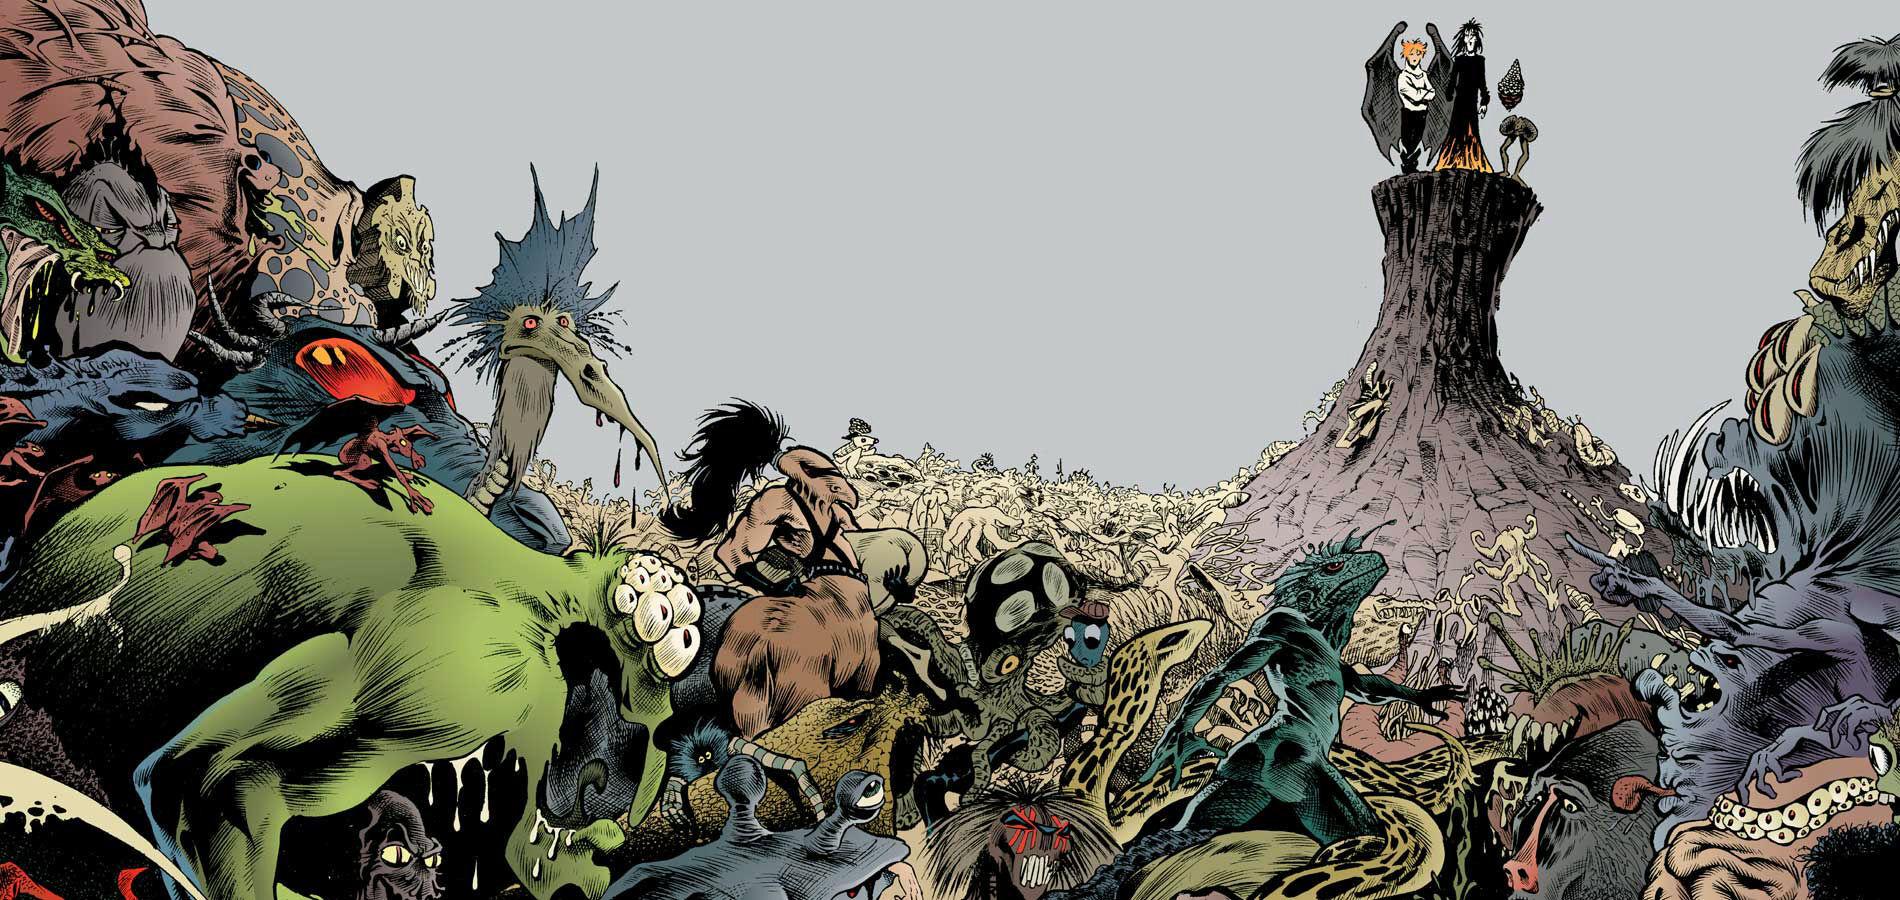 The Sandman Recensione - Nerdcore - Lucifero